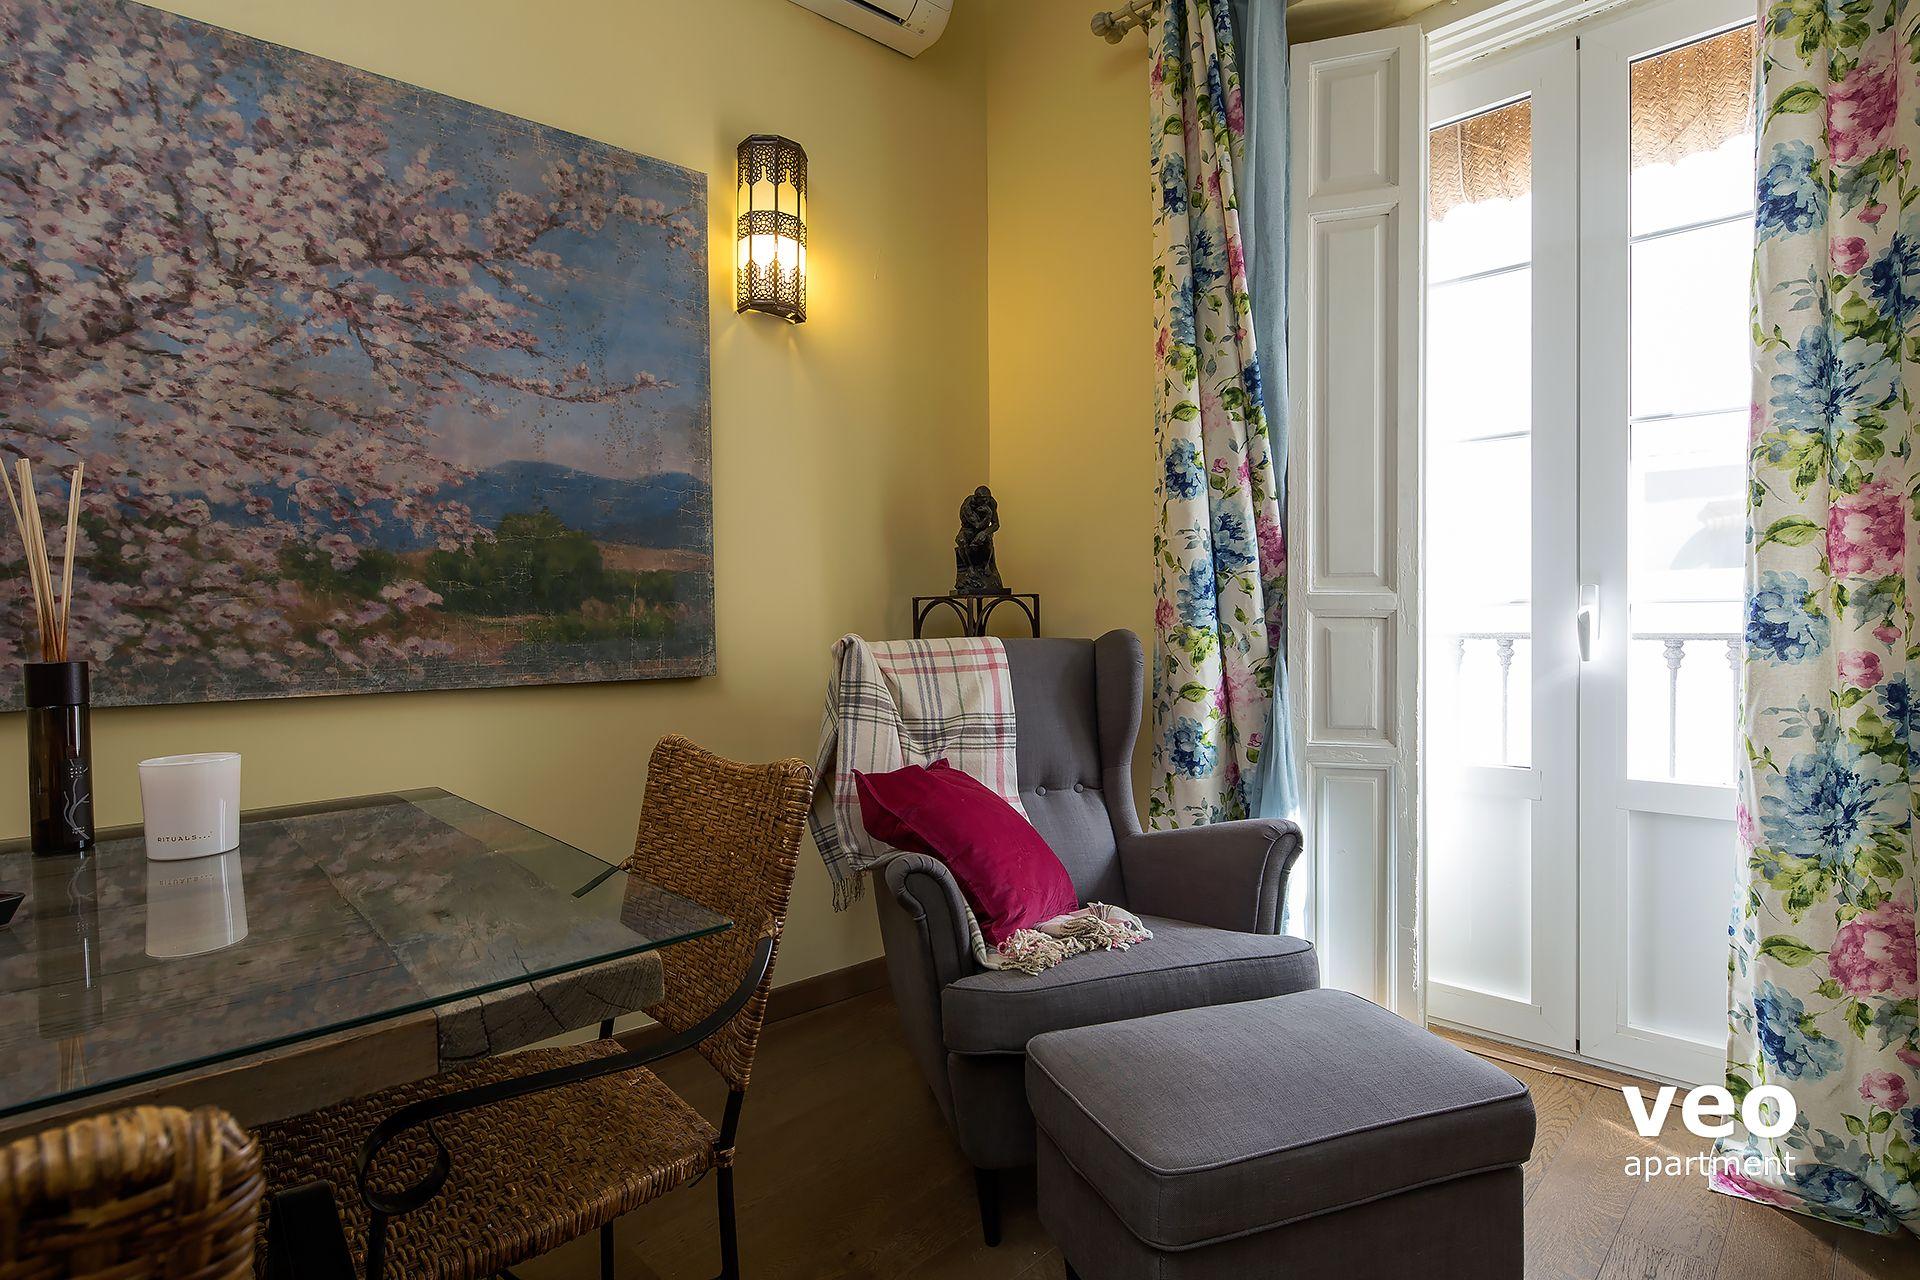 location appartement zaragoza